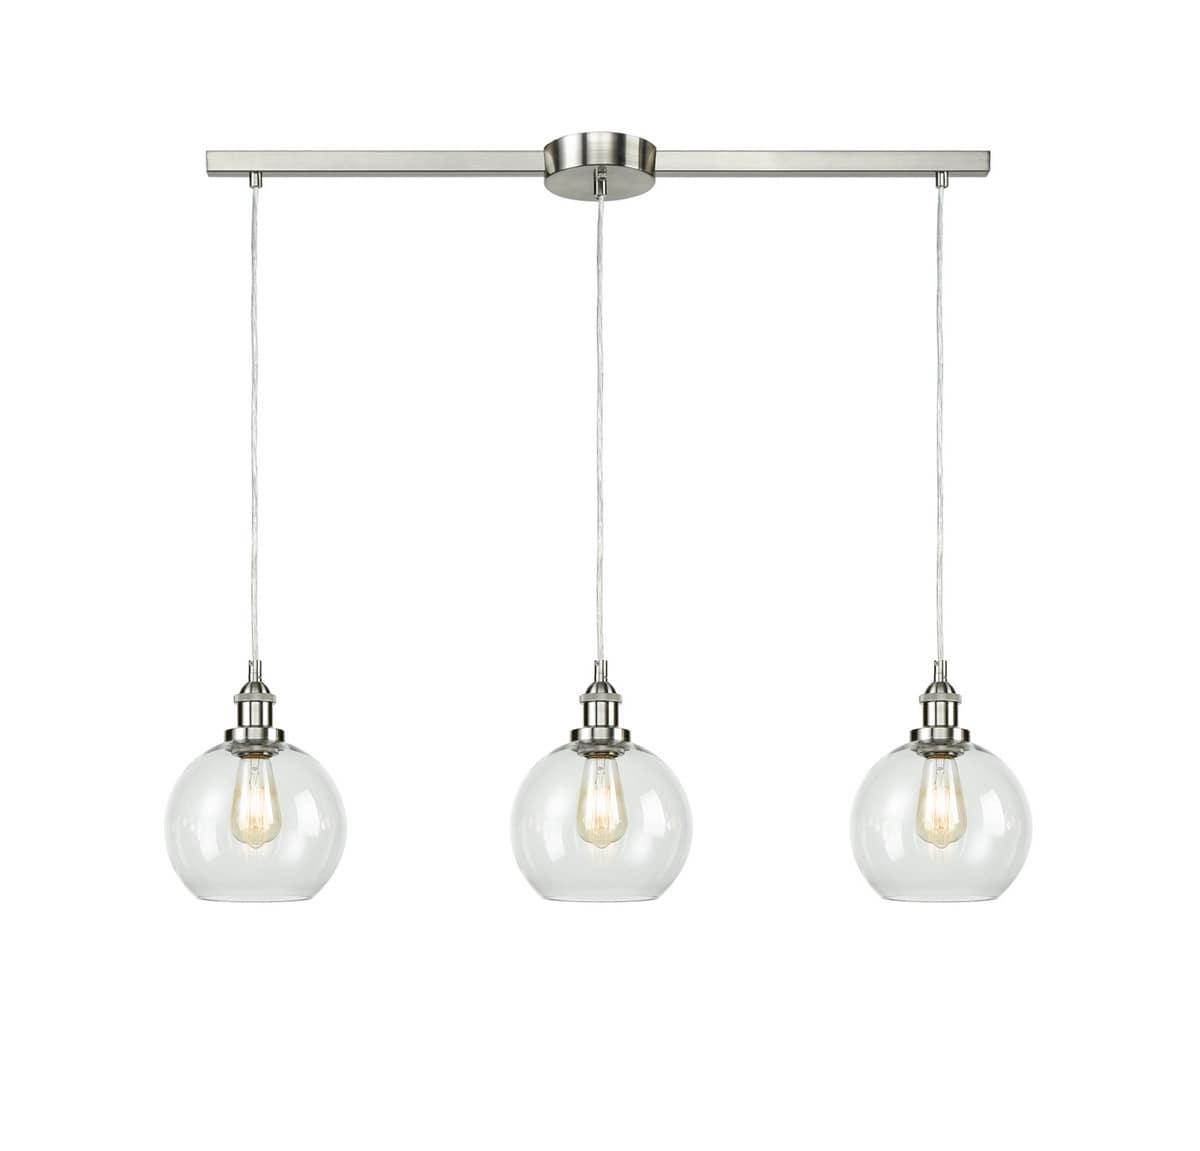 Industrial Kitchen Island Globe Pendant Light 3-Light Brushed Nickel